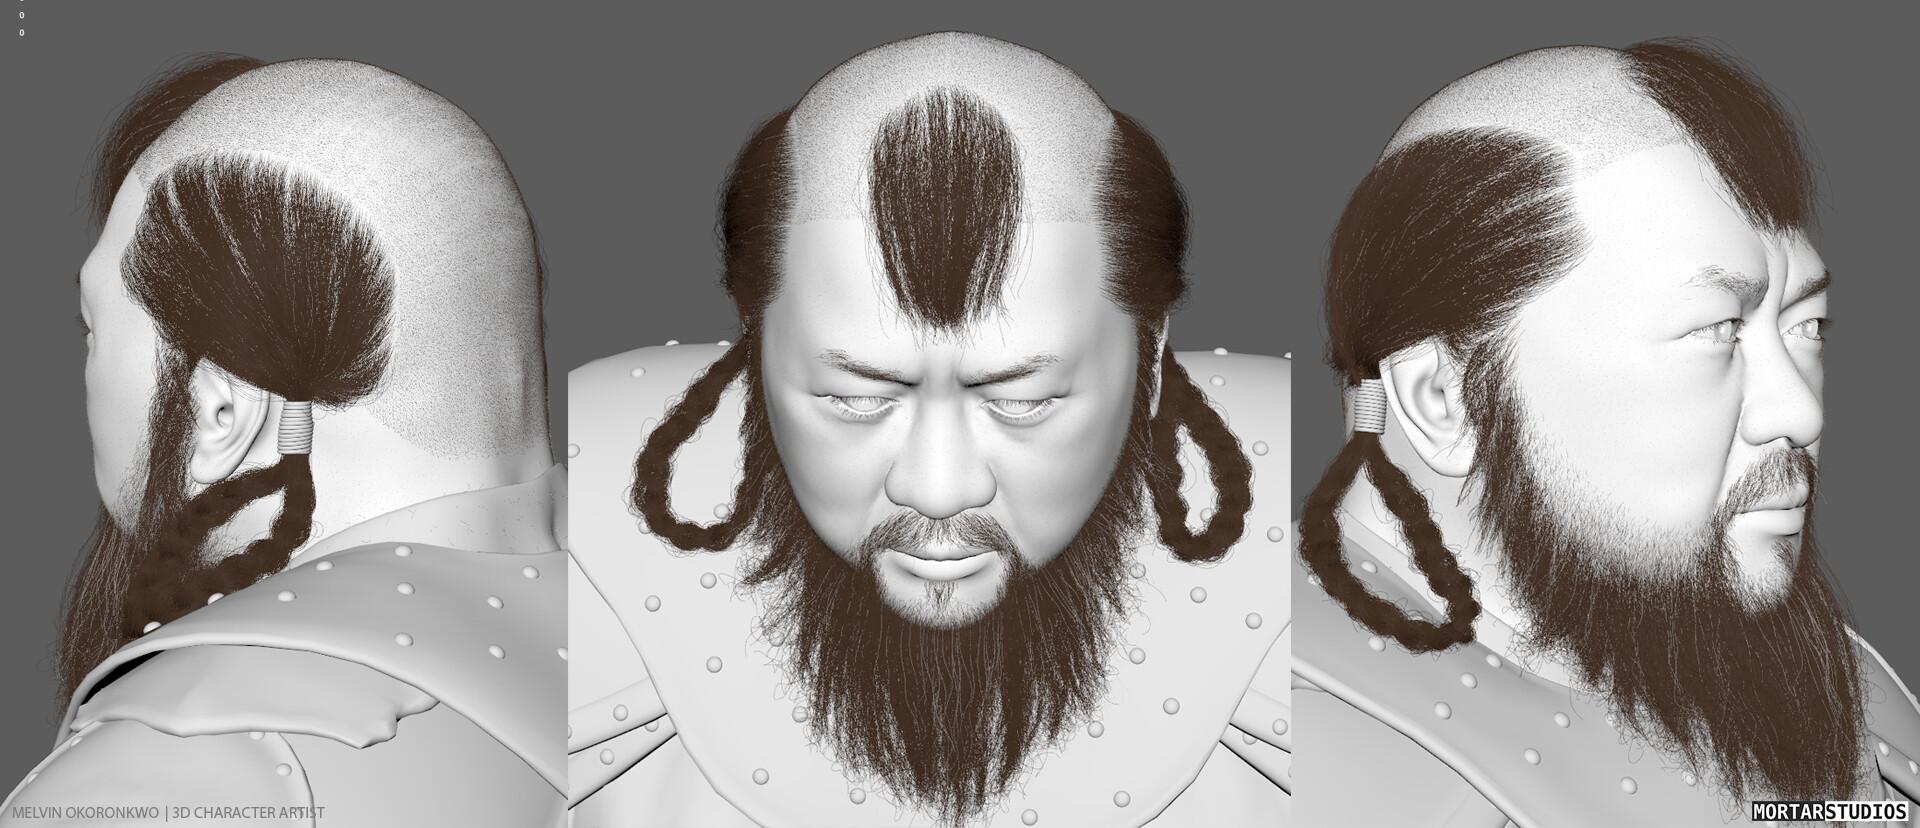 melvin-okoronkwo-xgen-hairs.jpg